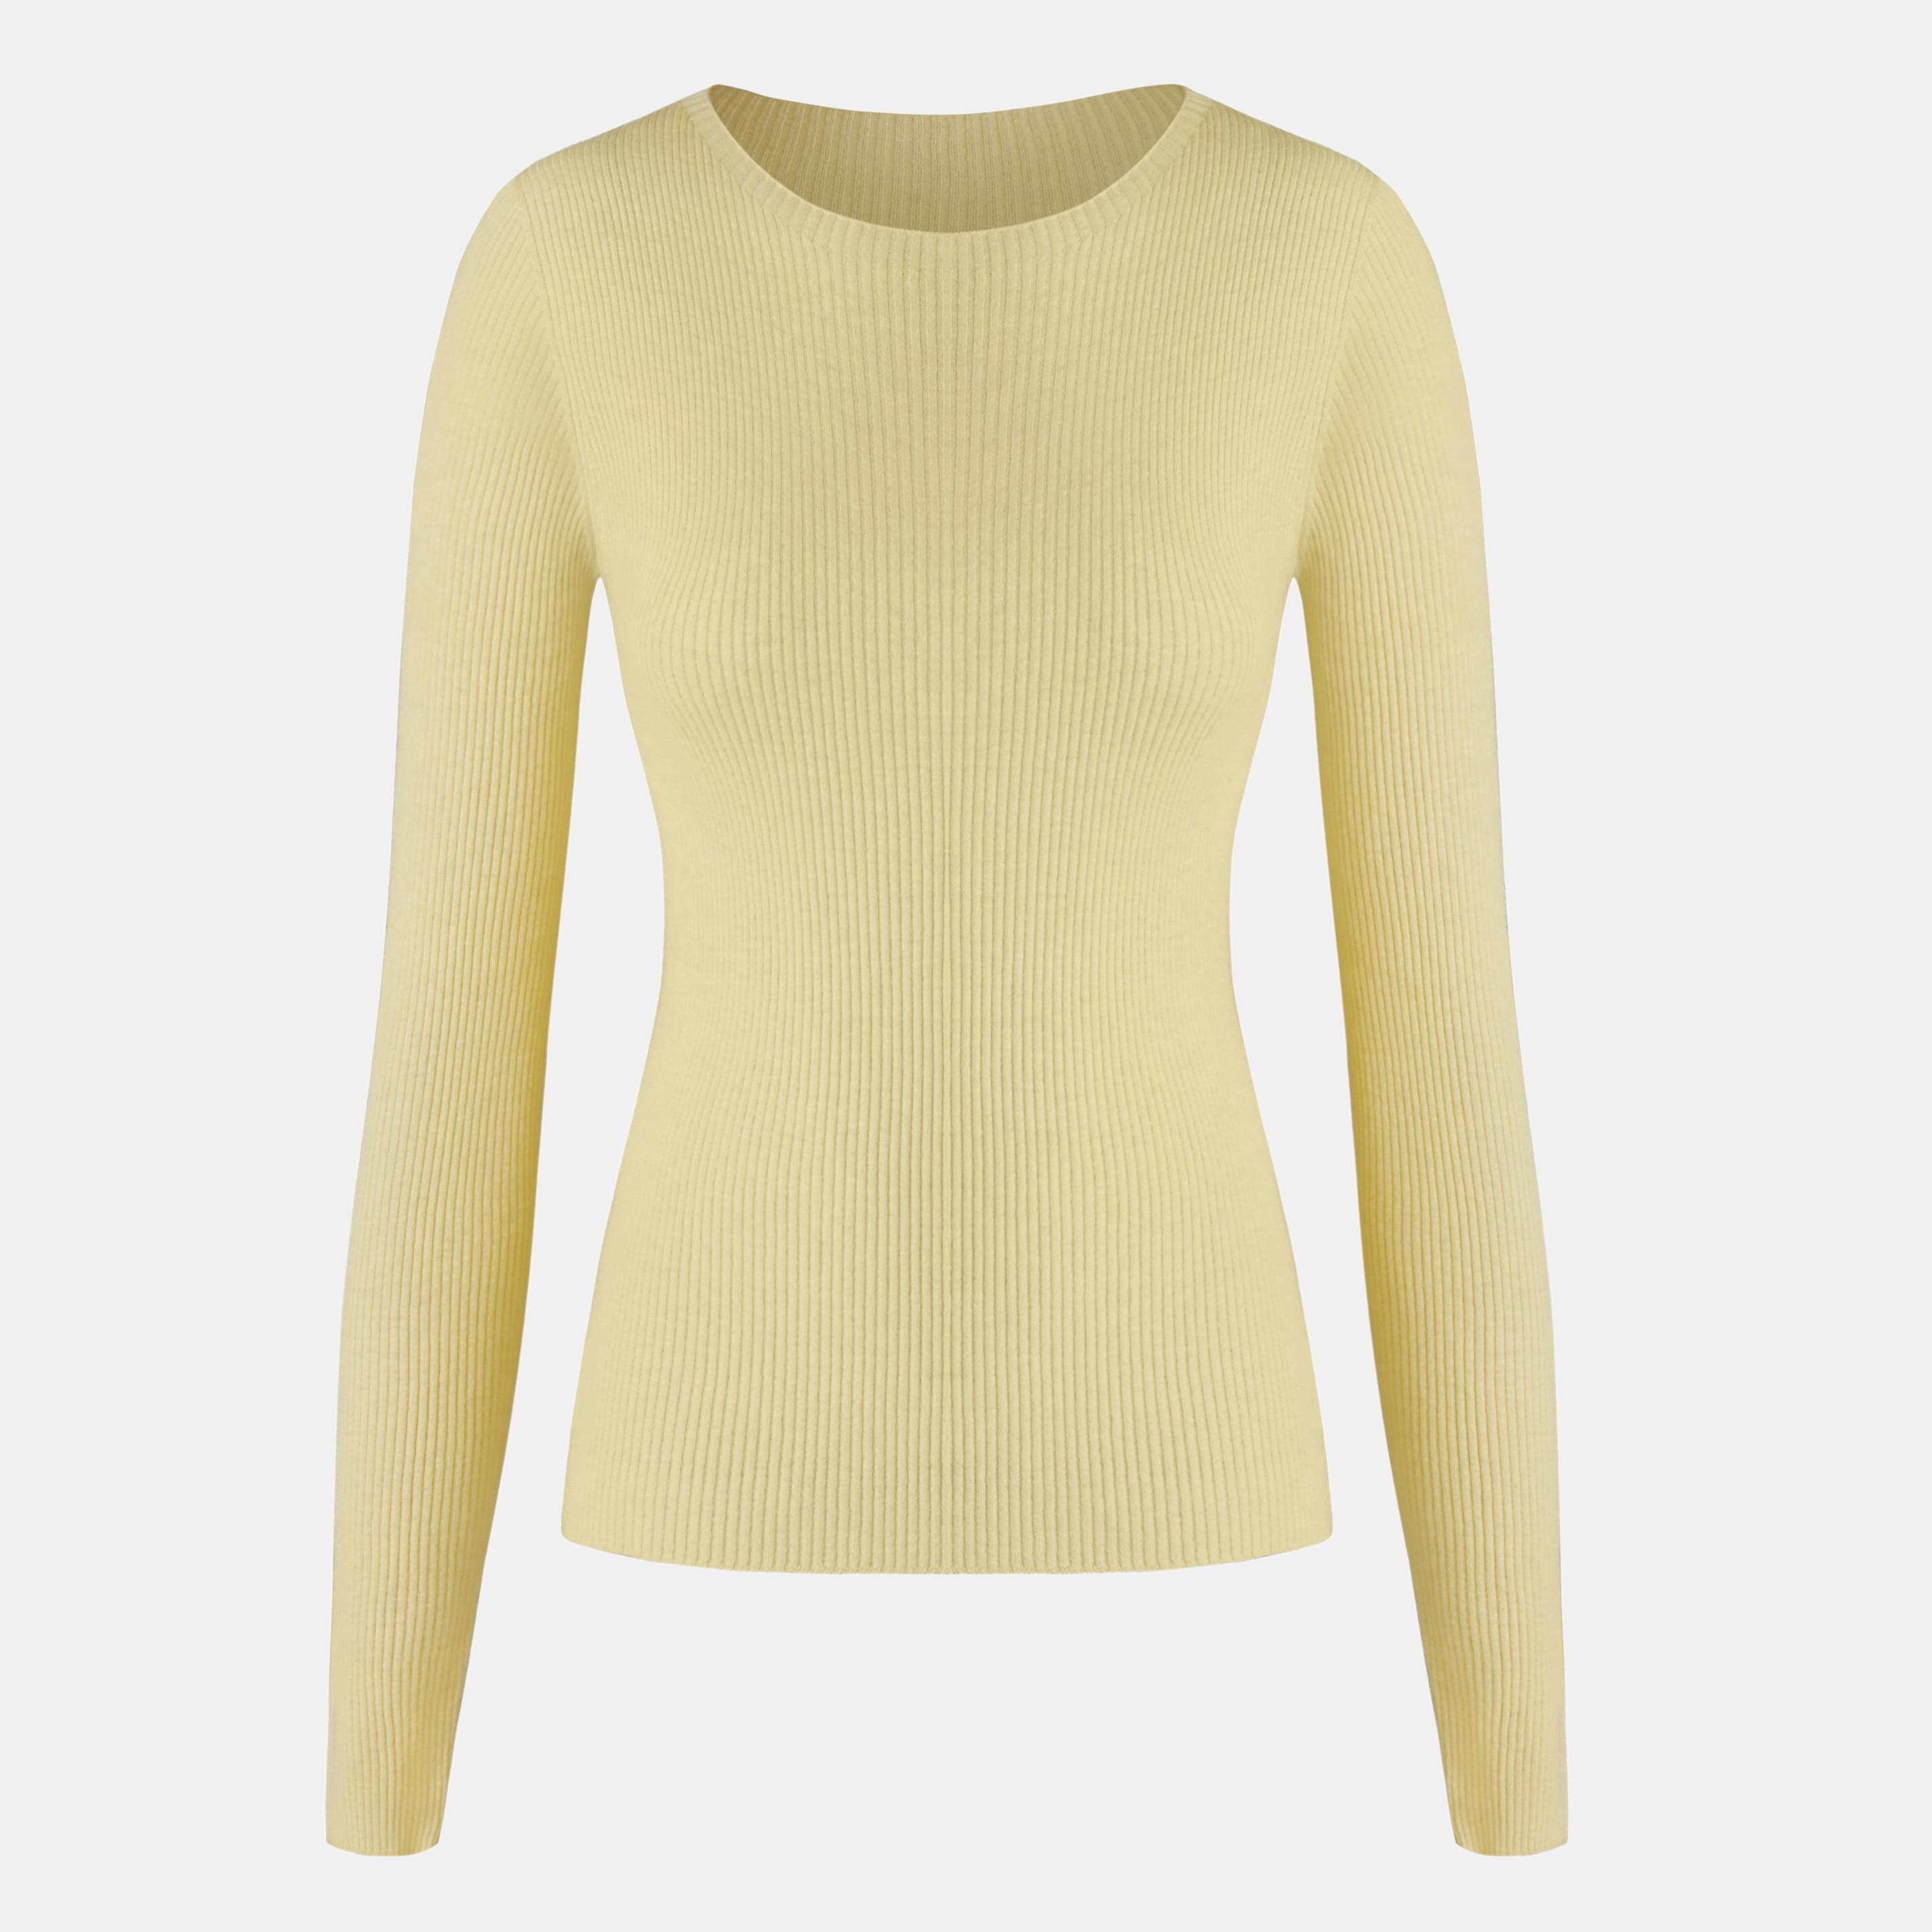 Cashmere Top-Lemon Yellow - Lemon Yellow S